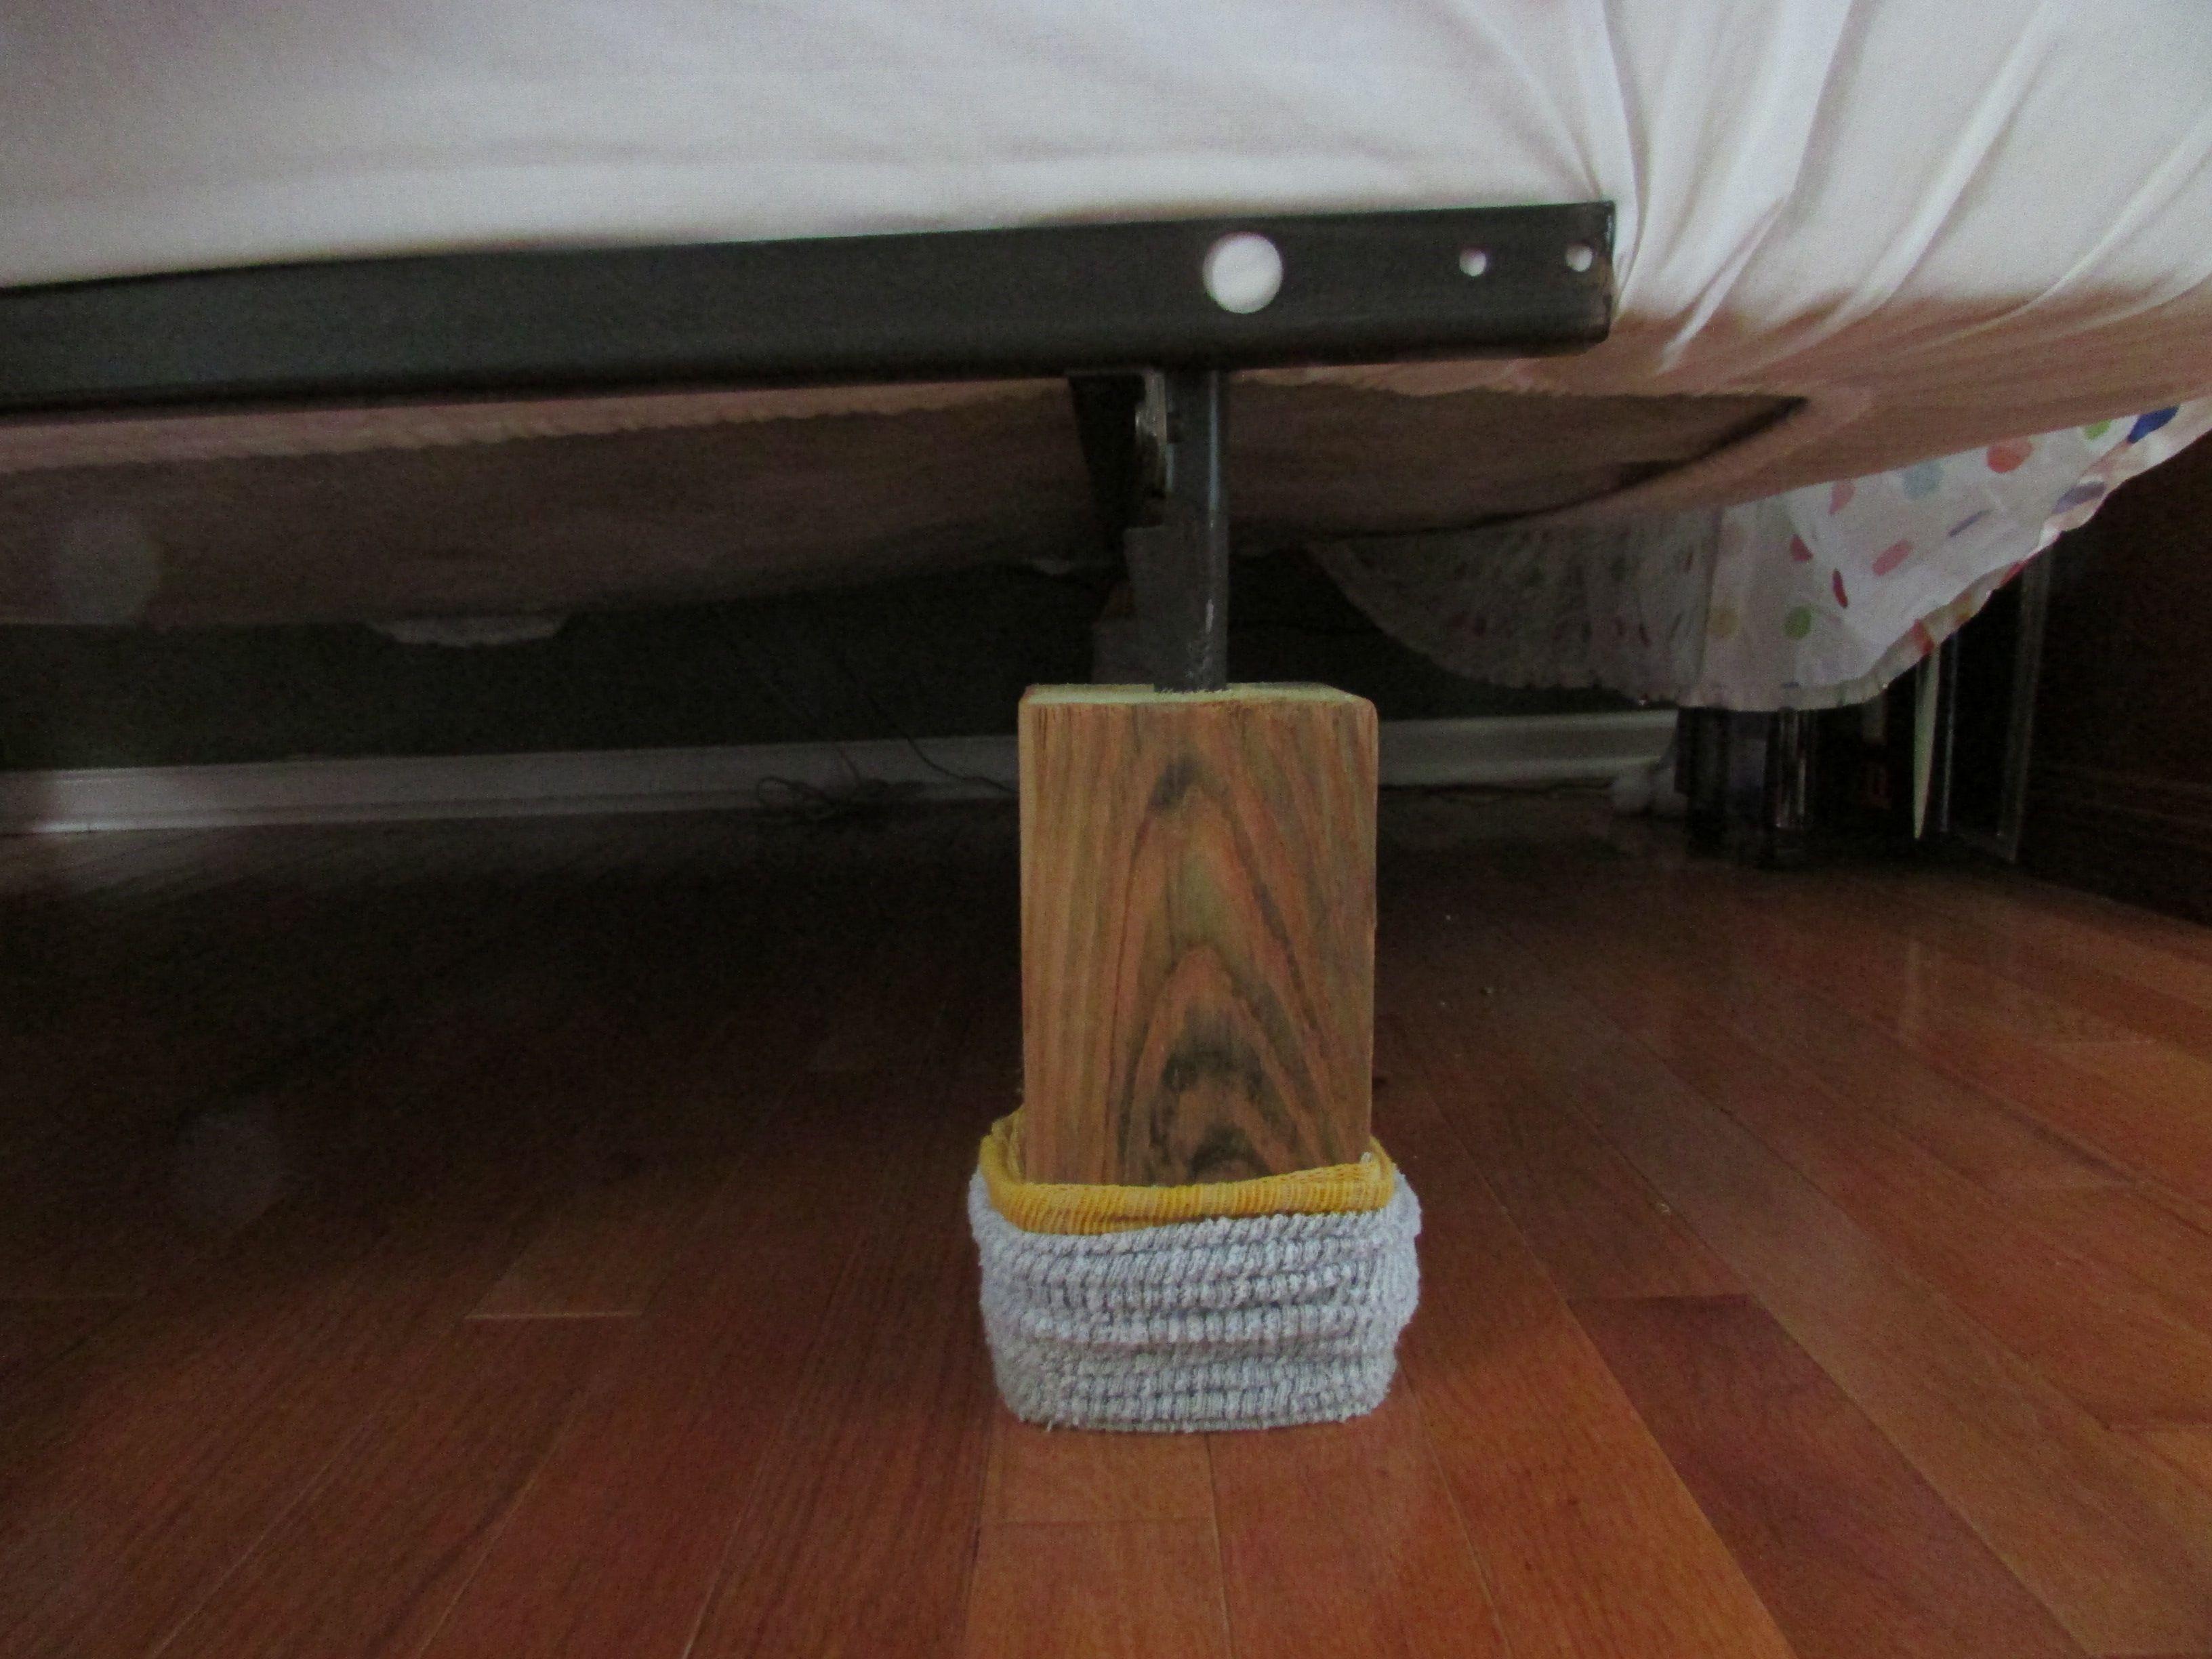 28 Nice Laminate Hardwood Flooring Lowes 2021 free download laminate hardwood flooring lowes of 21 new sofa risers lowes graphics everythingalyce com throughout 21 new sofa risers lowes graphics